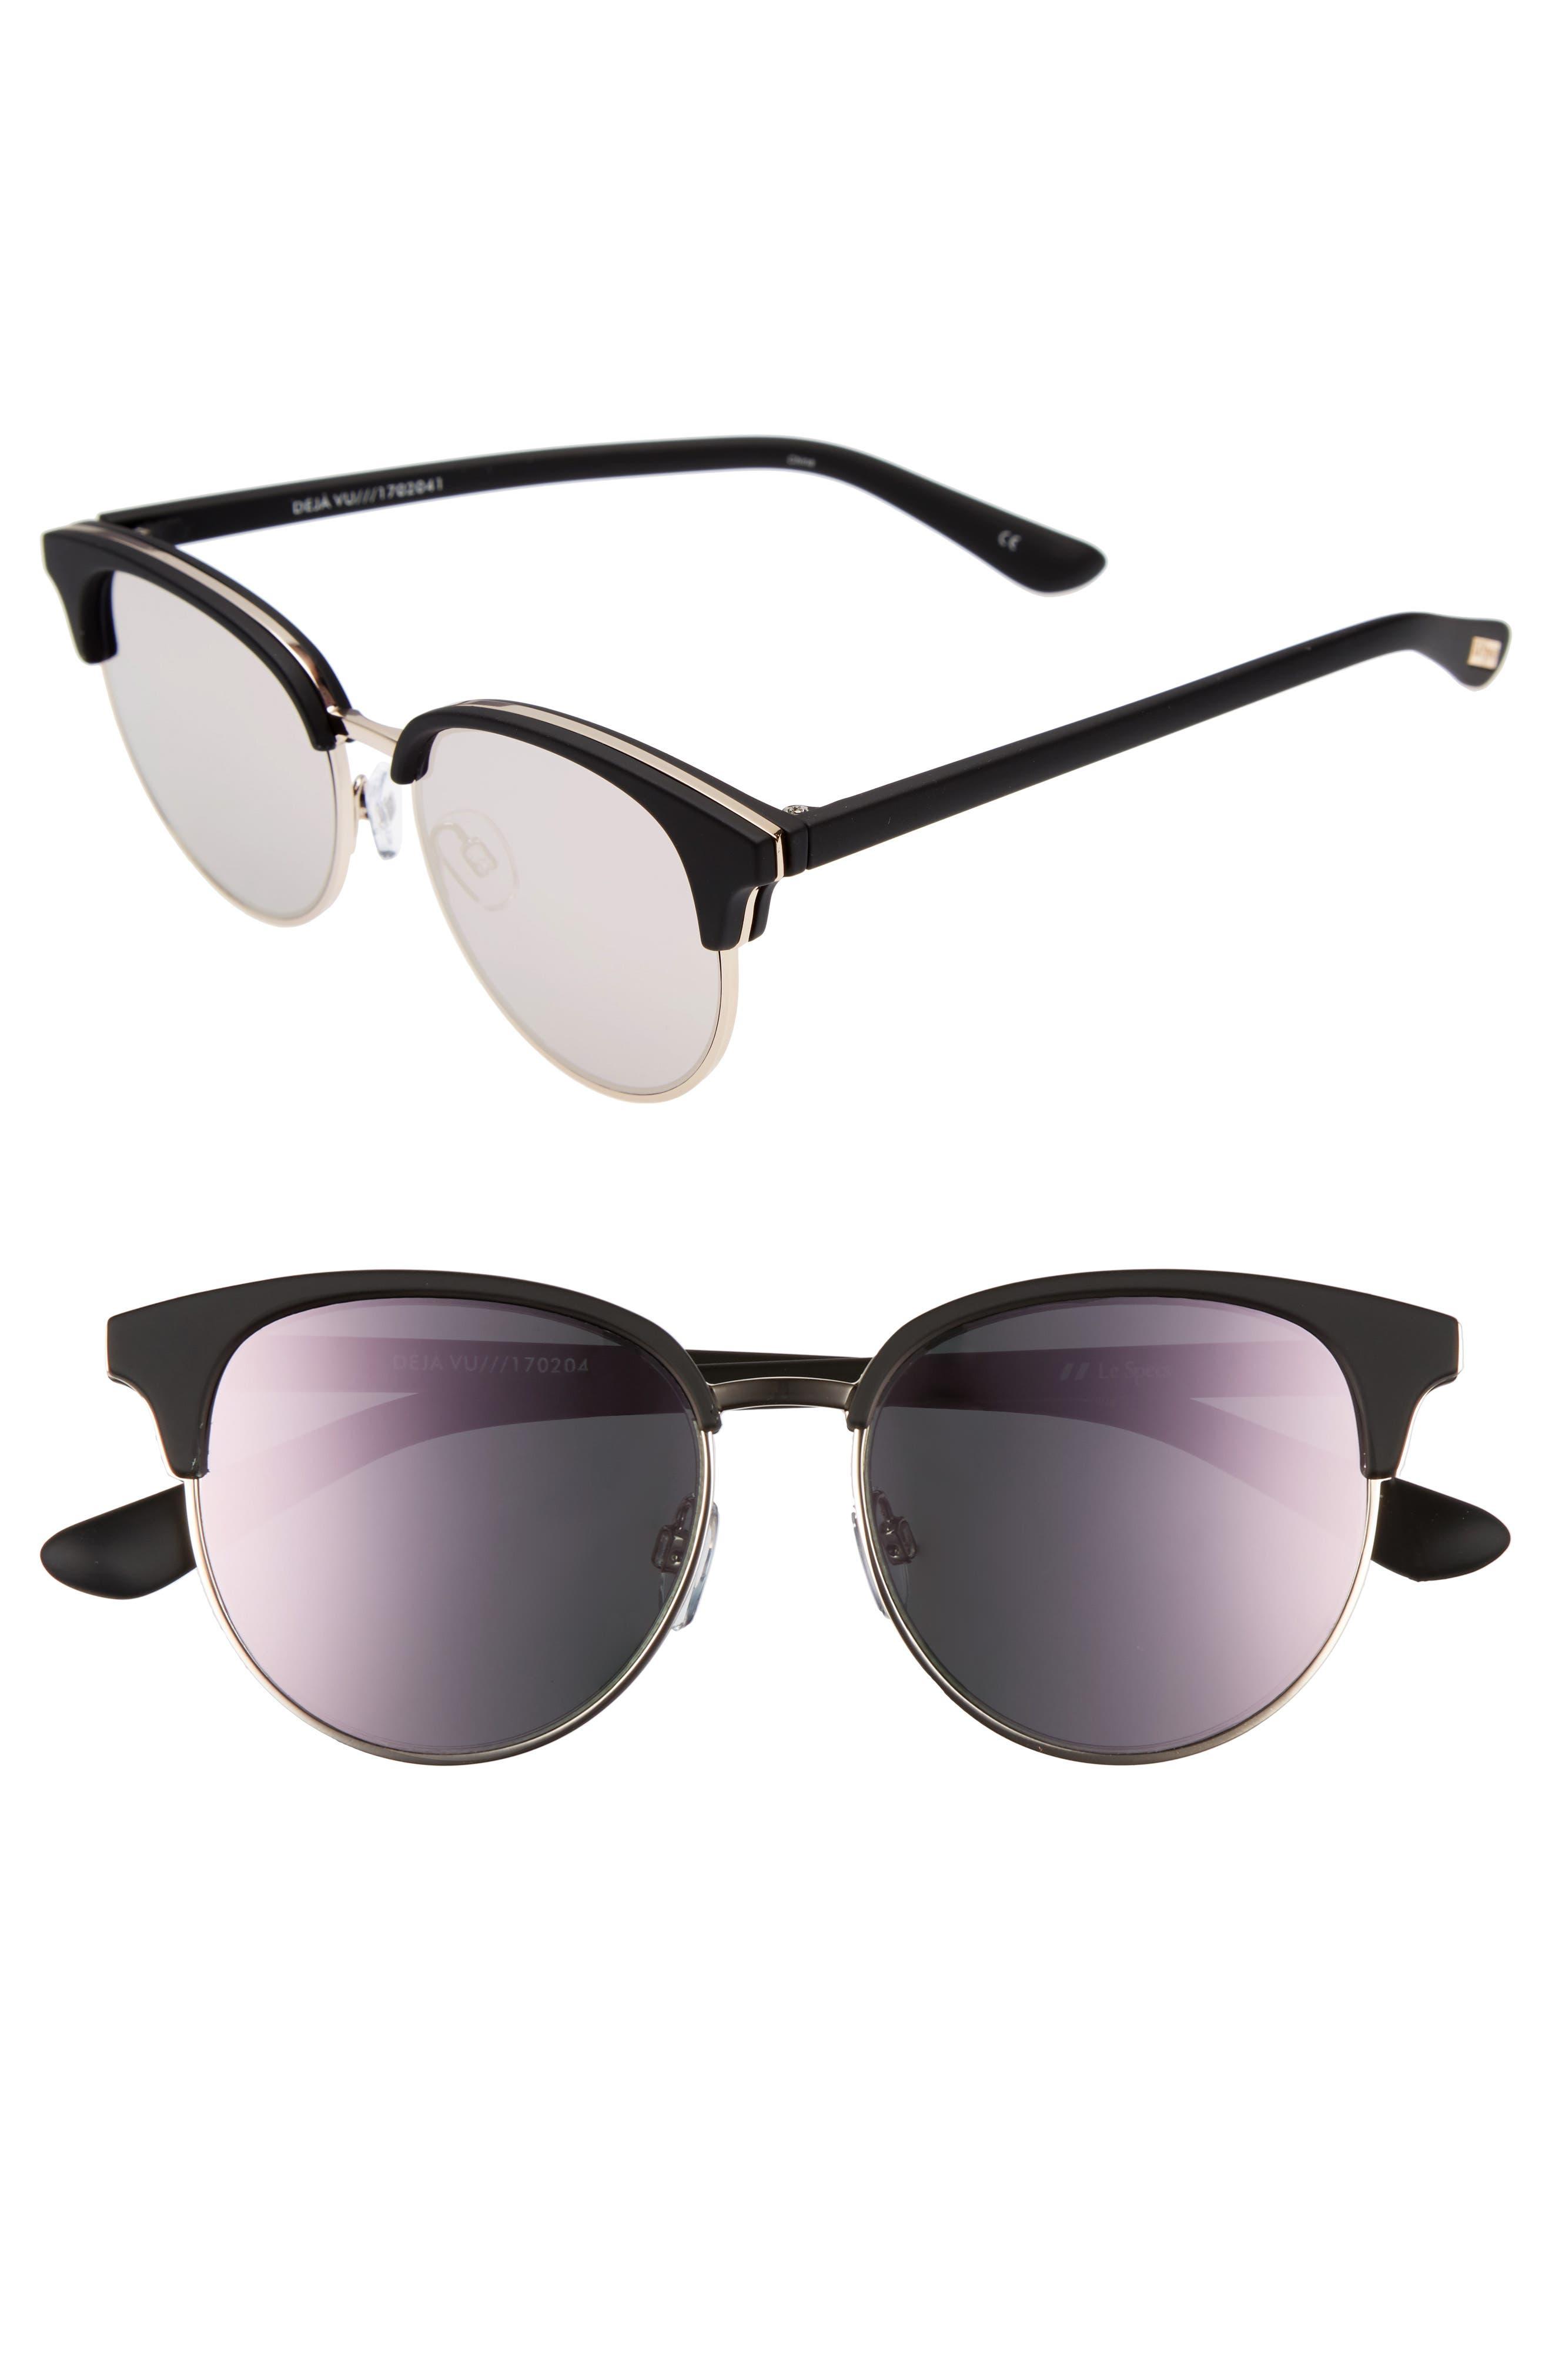 Main Image - Le Specs Deja Vu 51mm Round Sunglasses